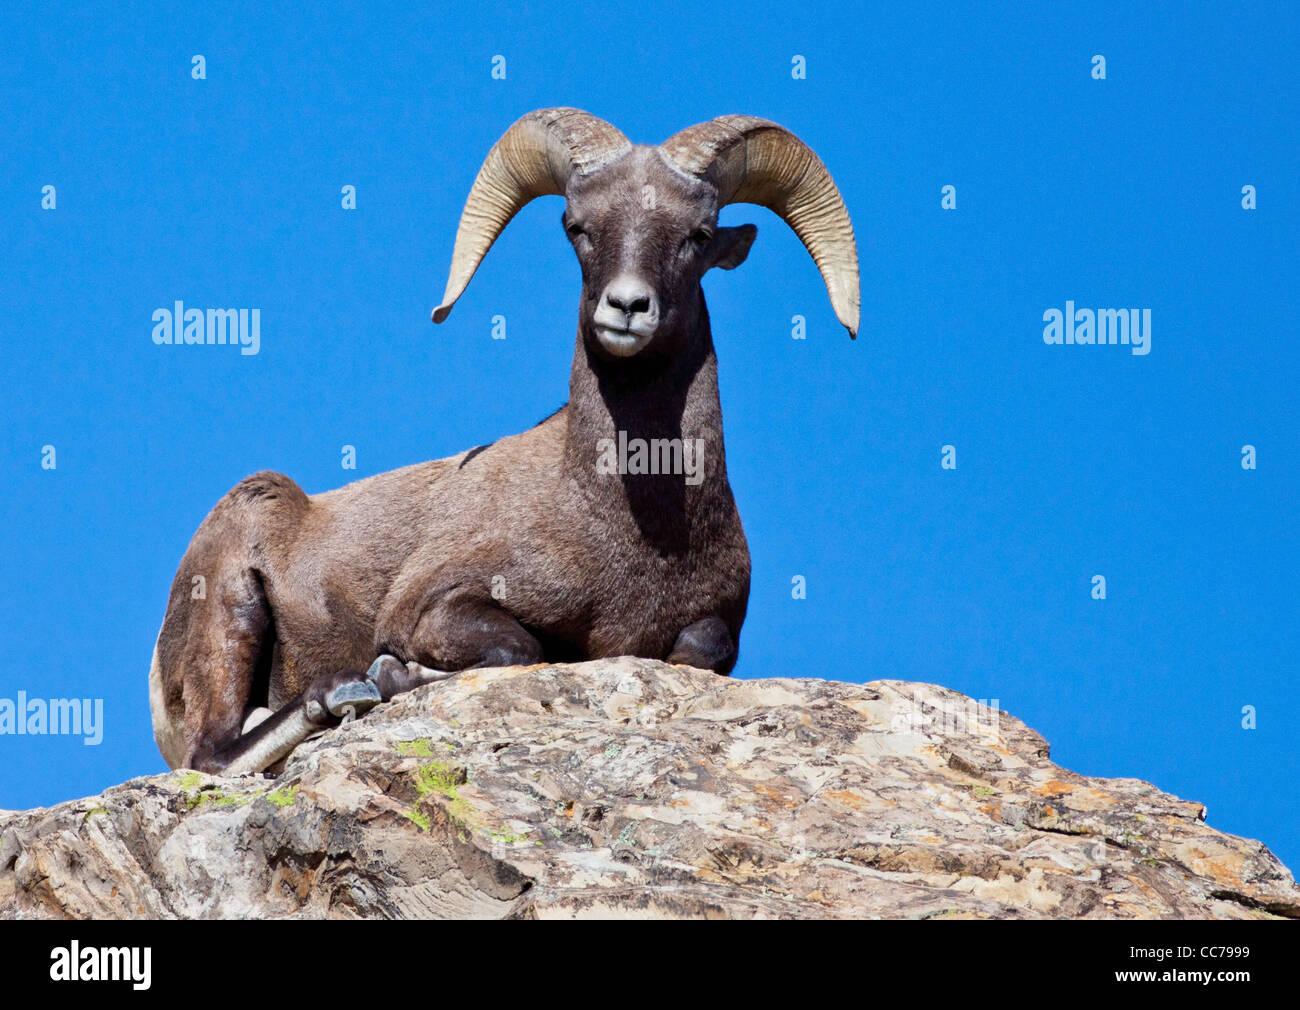 Rocky Mountain Big Horn sheep - Stock Image